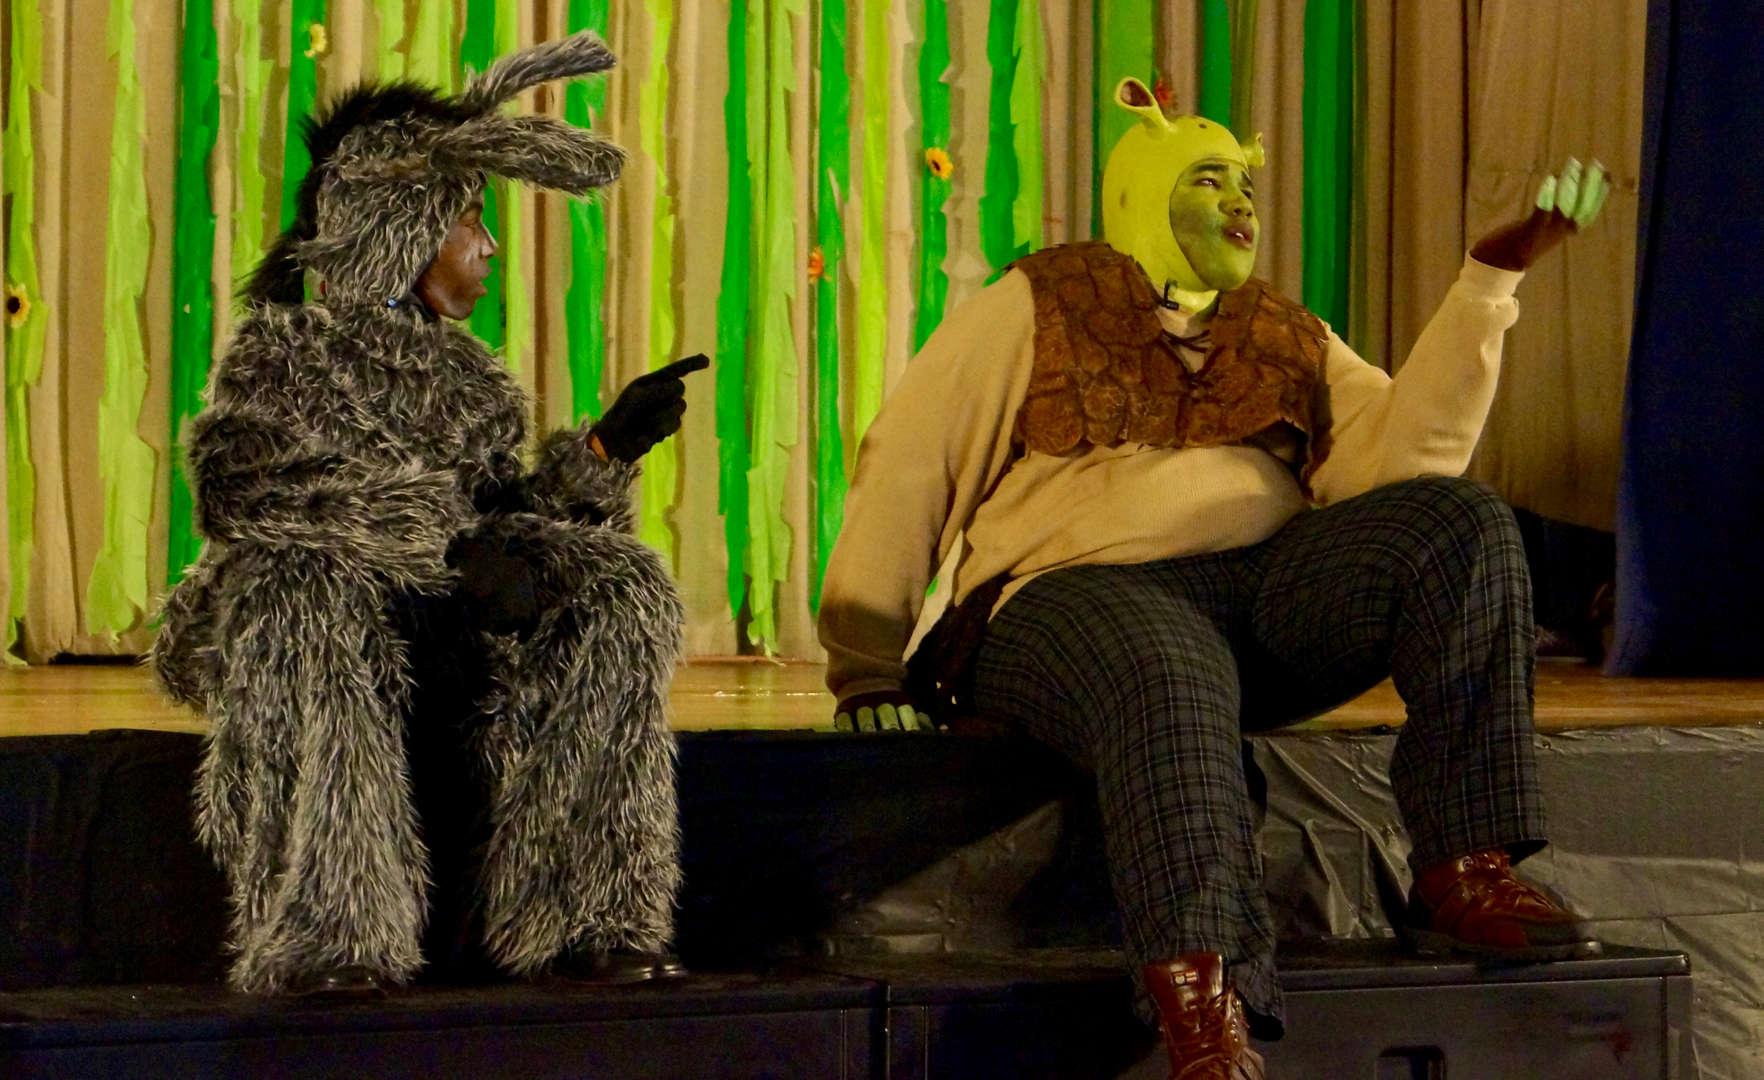 Shrek dancing with Donkey